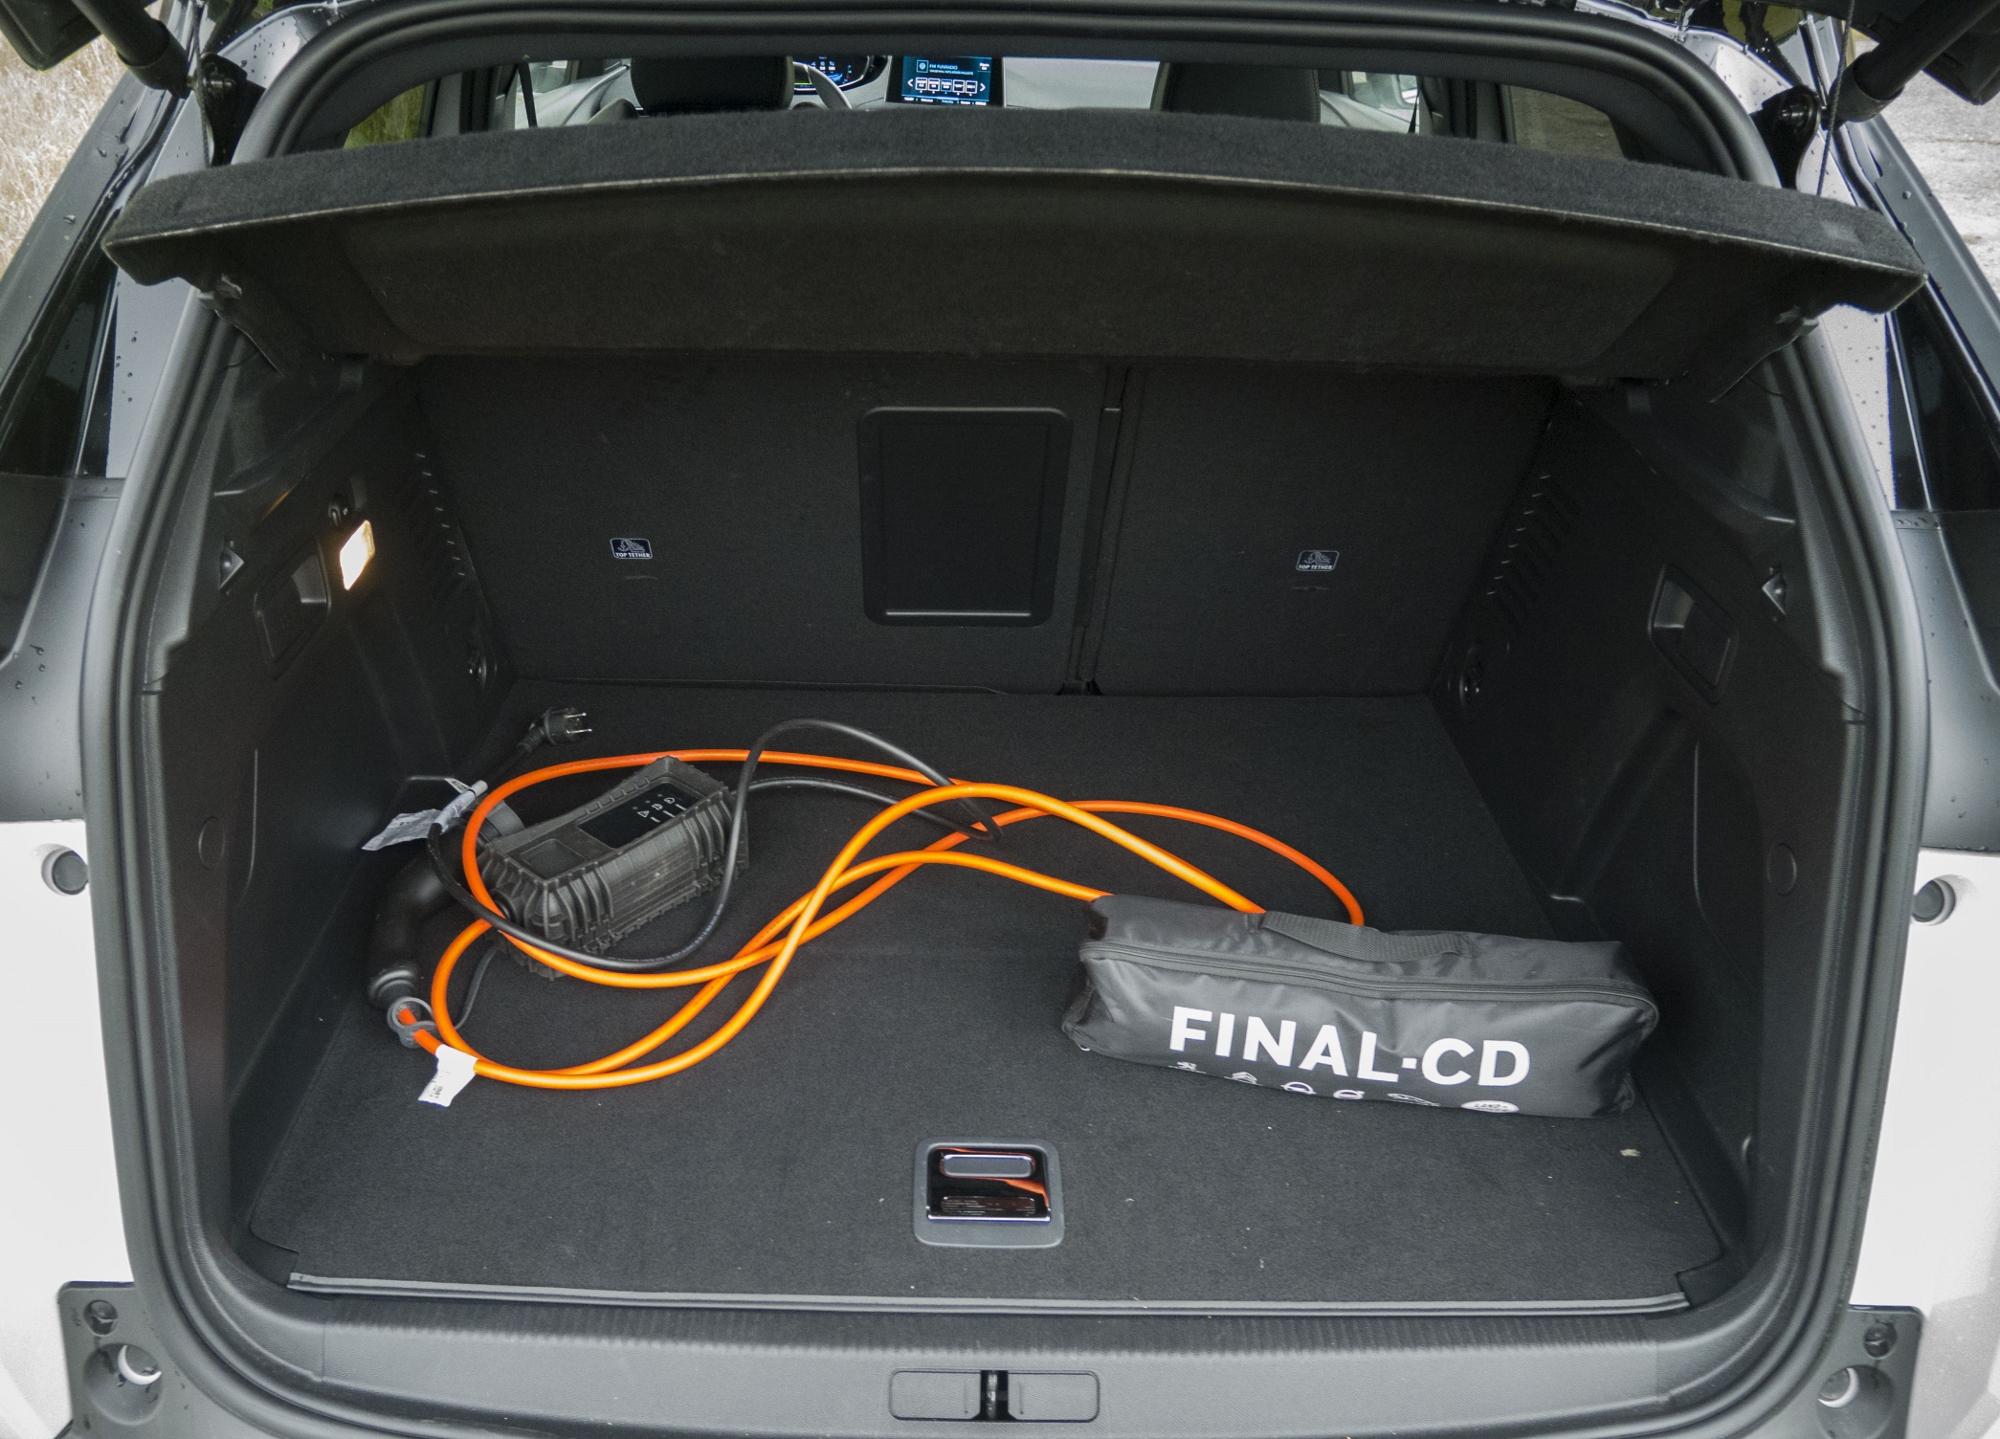 Test: Peugeot 3008 posúva schopnosti plug in hybridov GO2aGZK5vs peugeot-3008-hybrid4-15